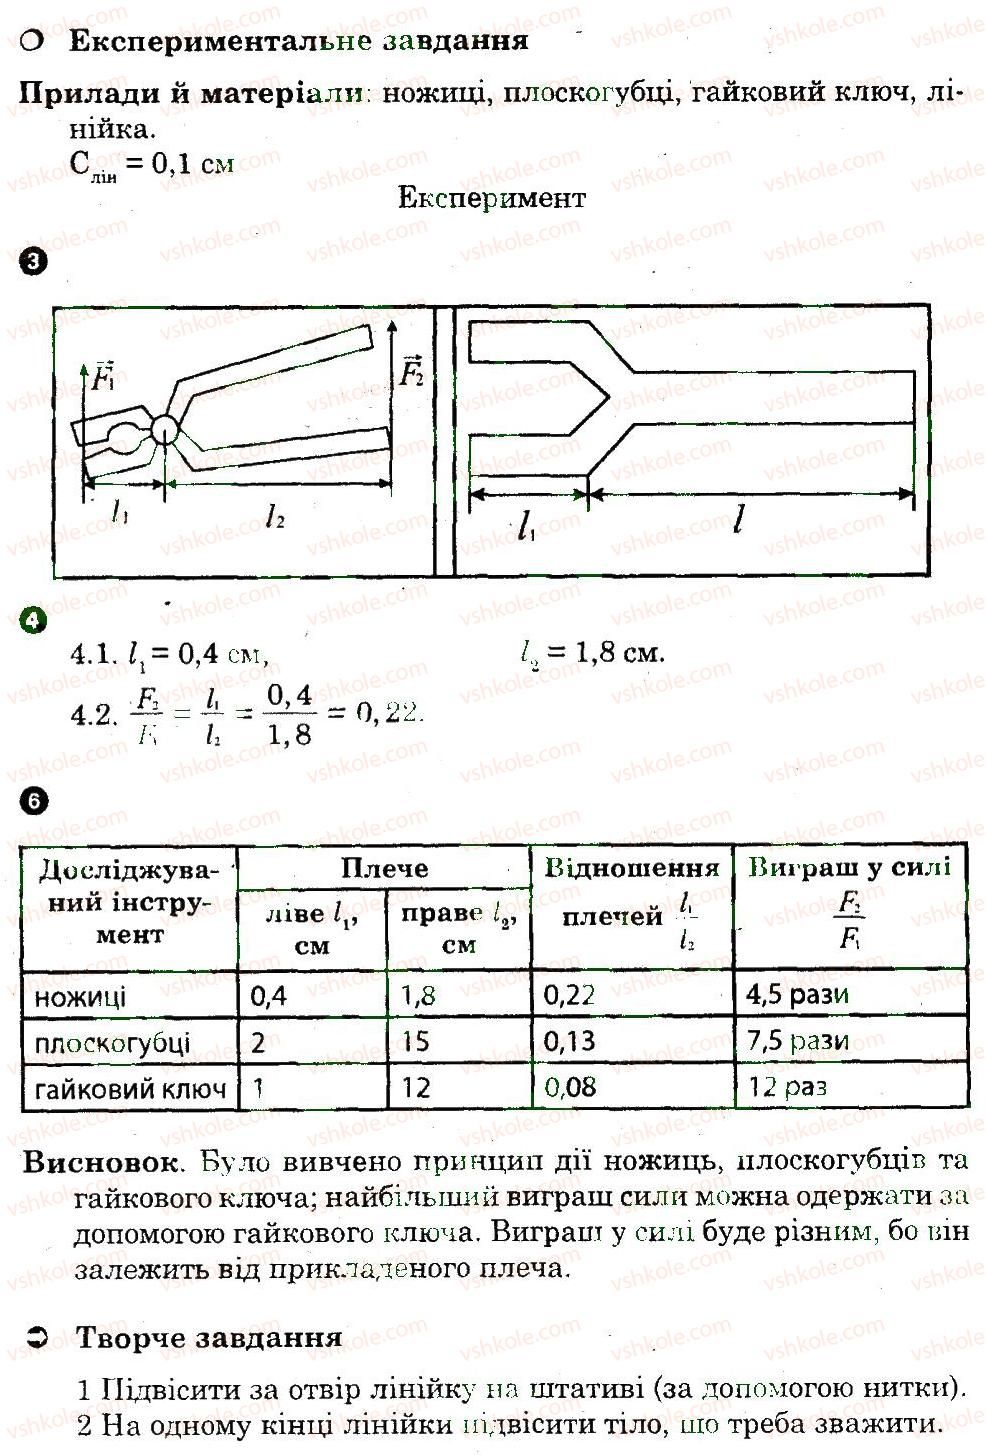 8-fizika-fya-bozhinova-oo-kiryuhina-2010-zoshit-dlya-laboratornih-robit--laboratorni-roboti-8-rnd7959.jpg